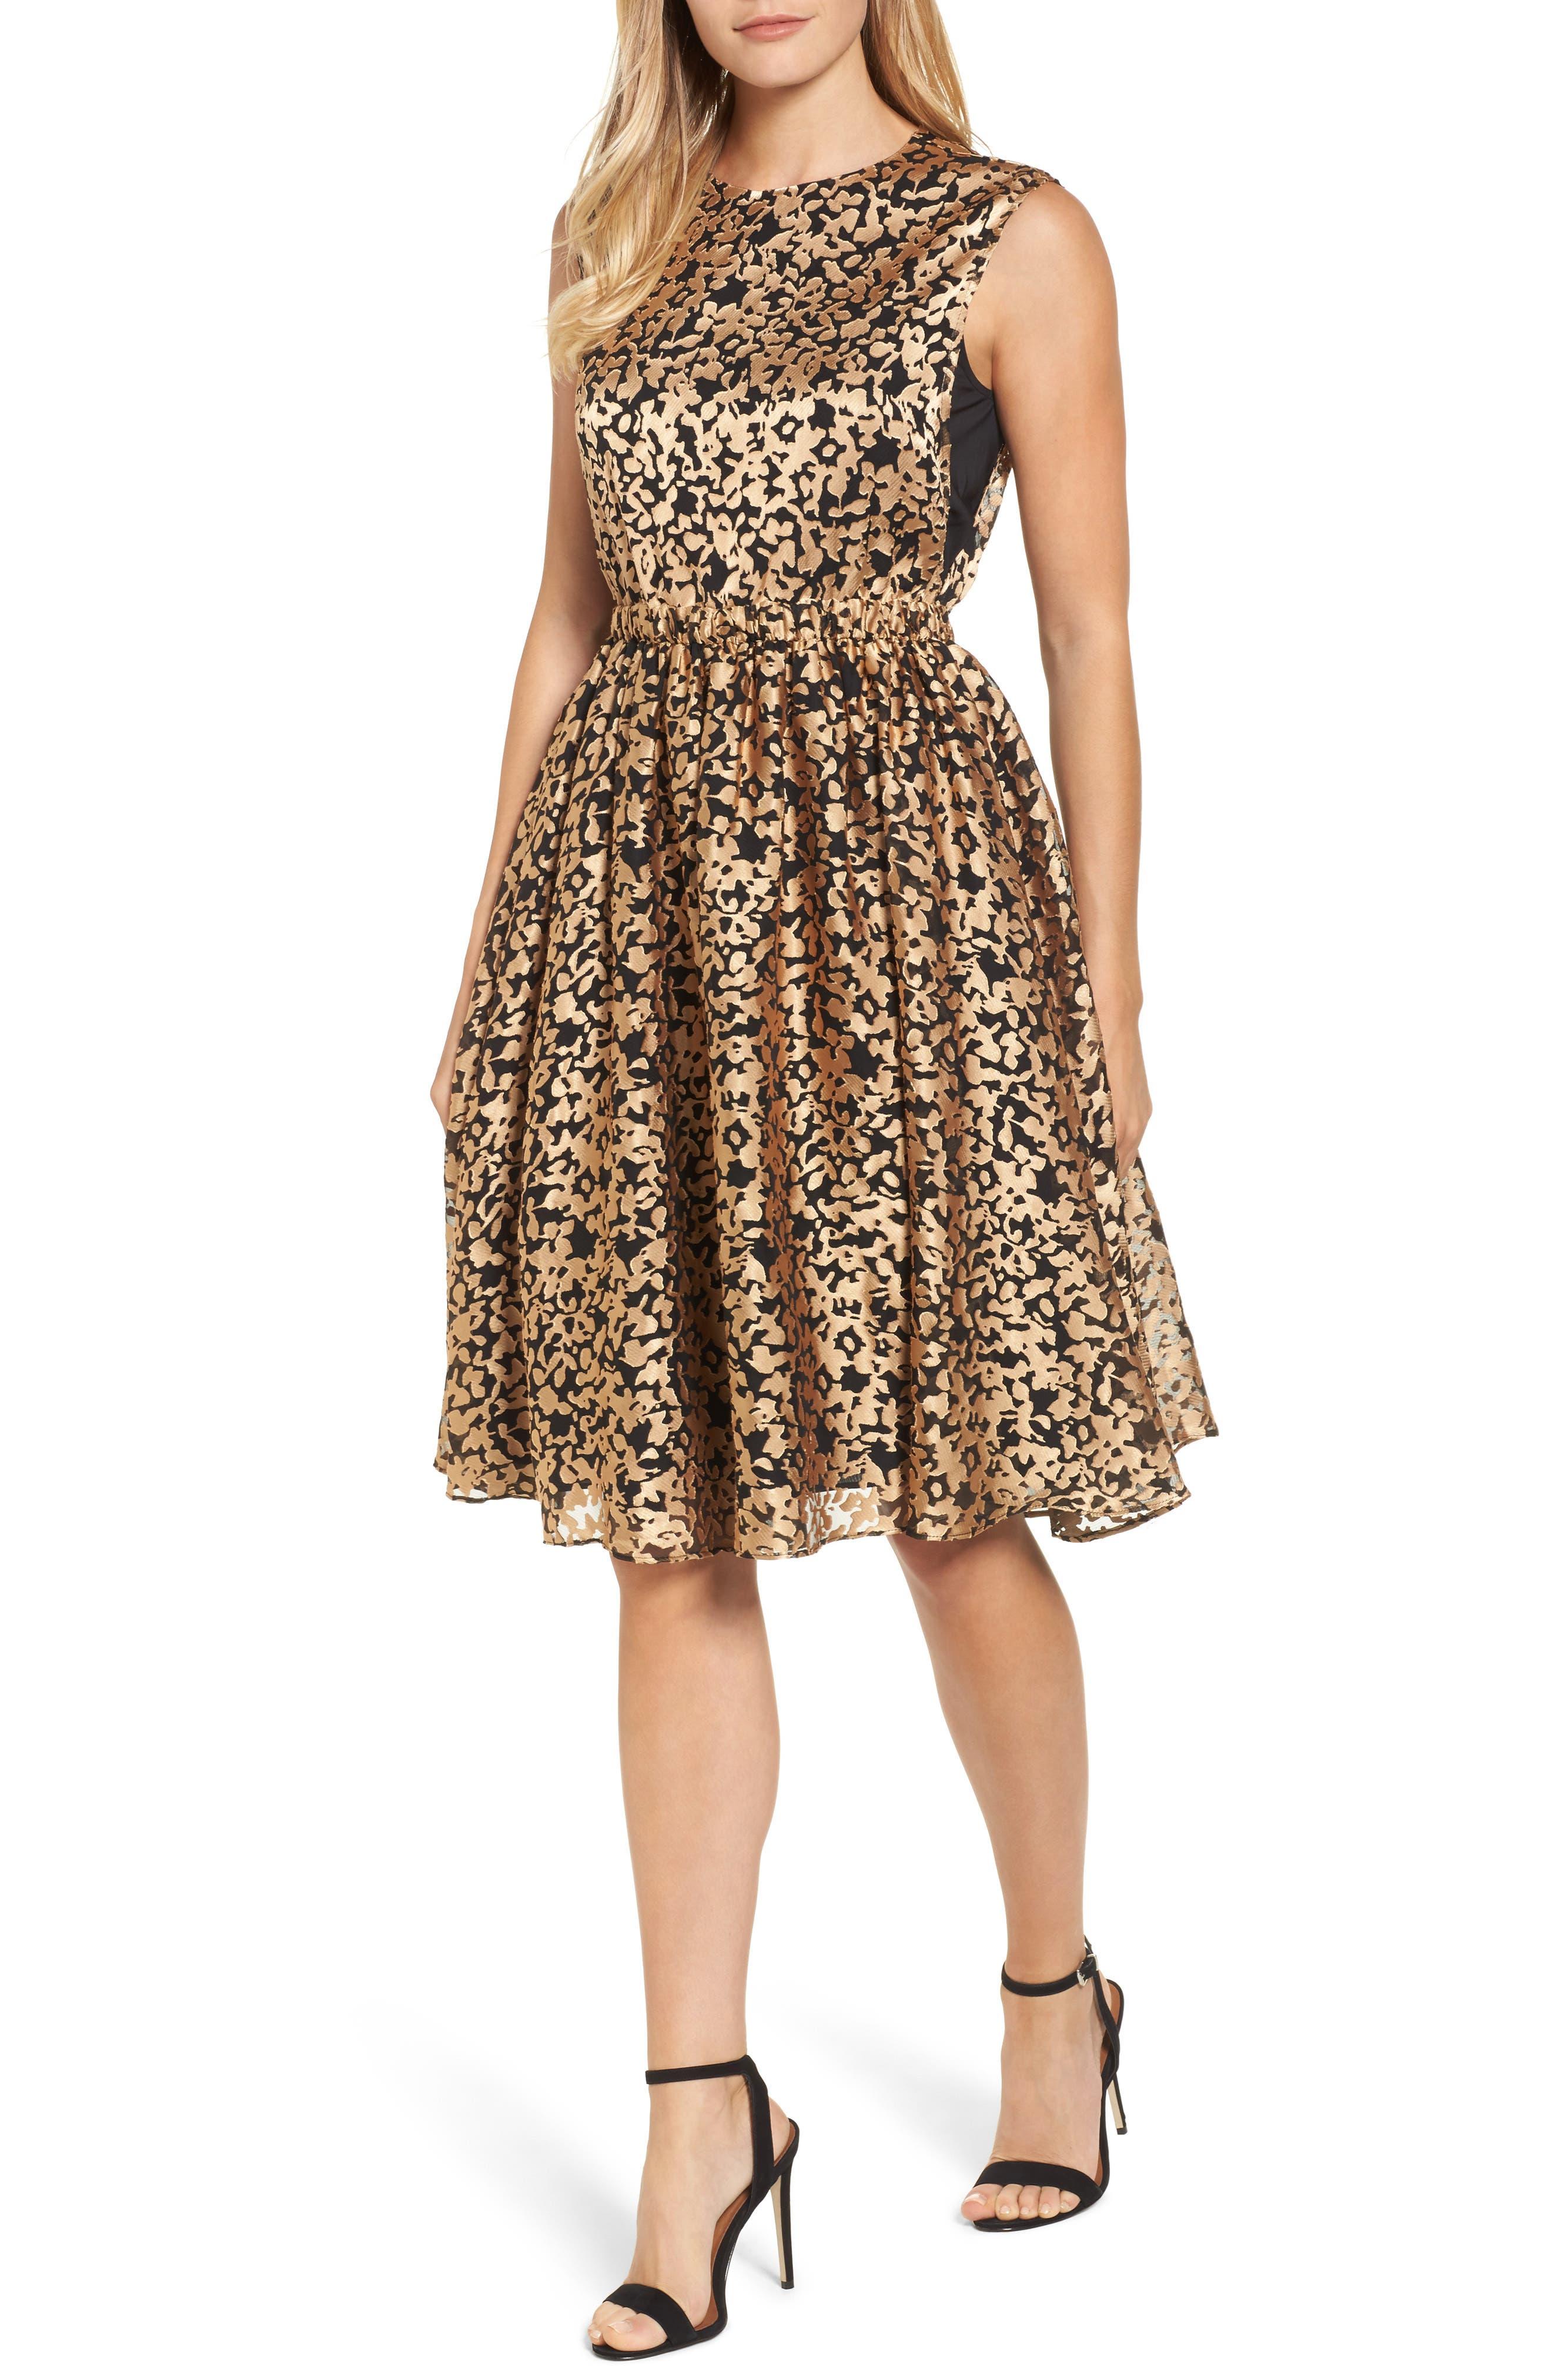 Main Image - Catherine Catherine Malandrino Kells Metallic Fit & Flare Dress